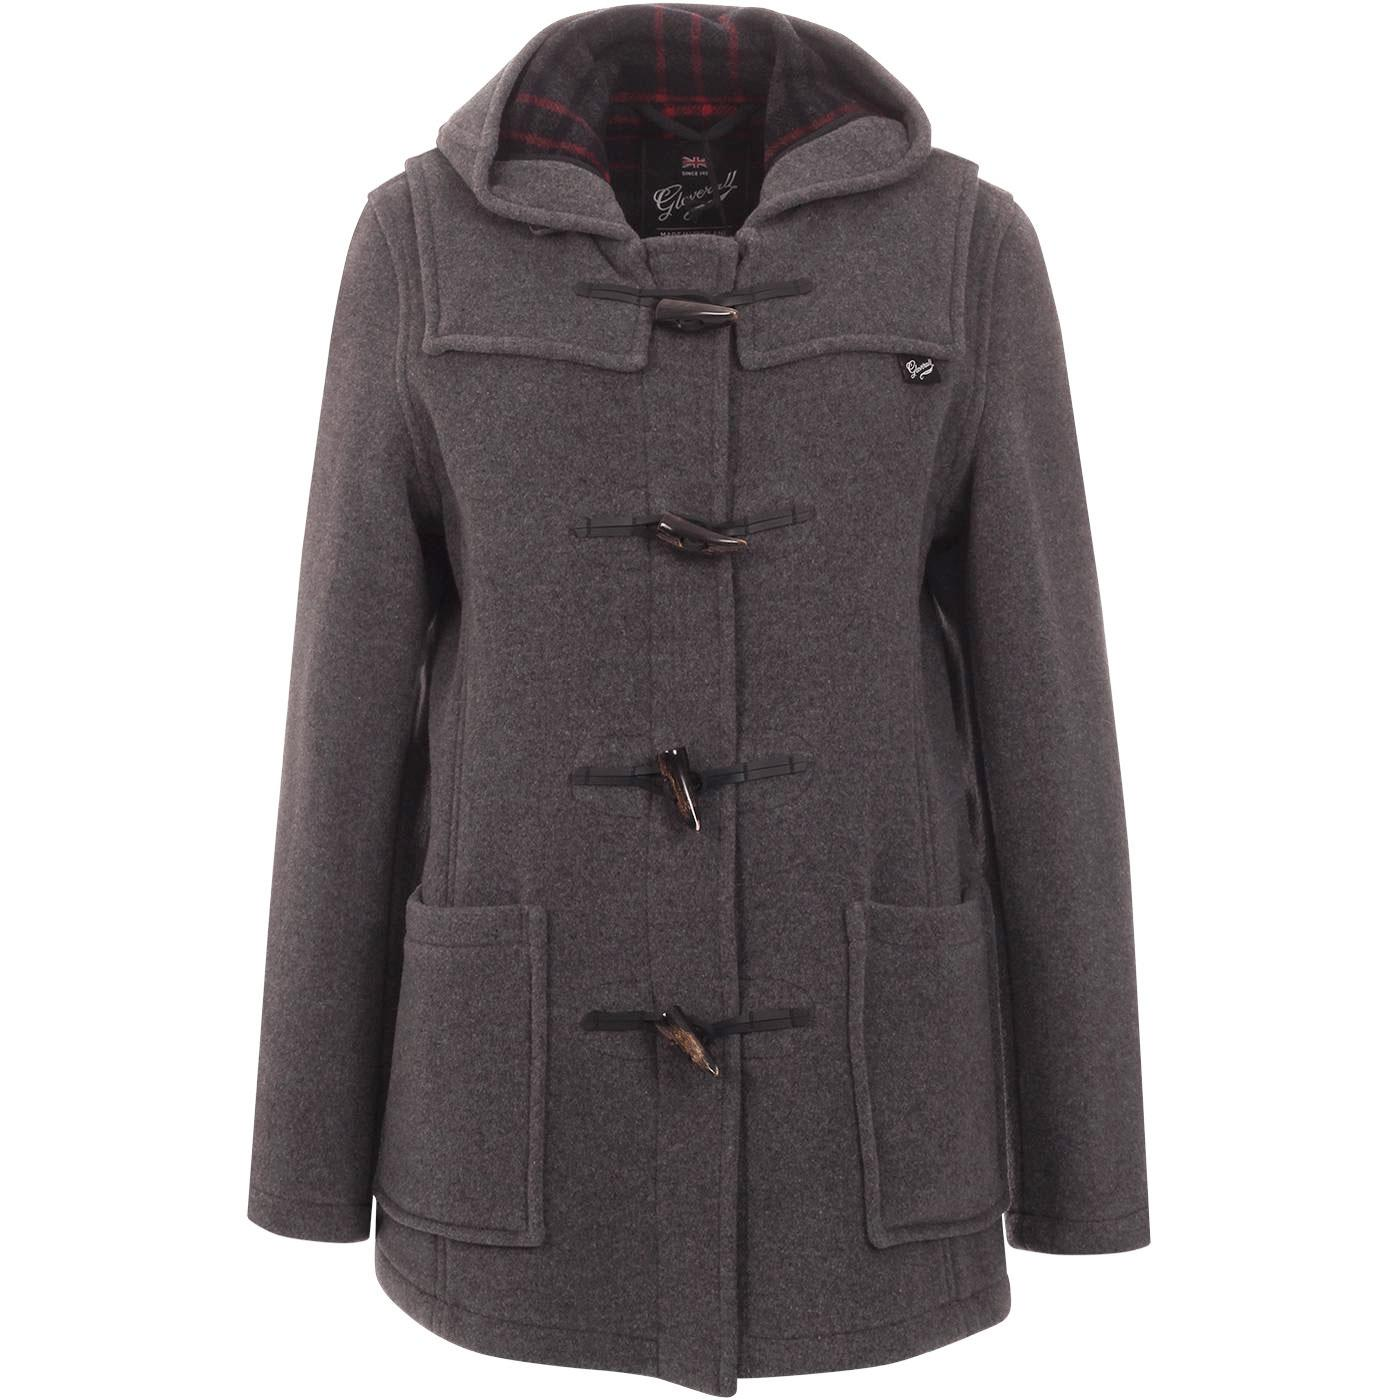 GLOVERALL Women's Retro Slim Fit Duffle Coat GREY